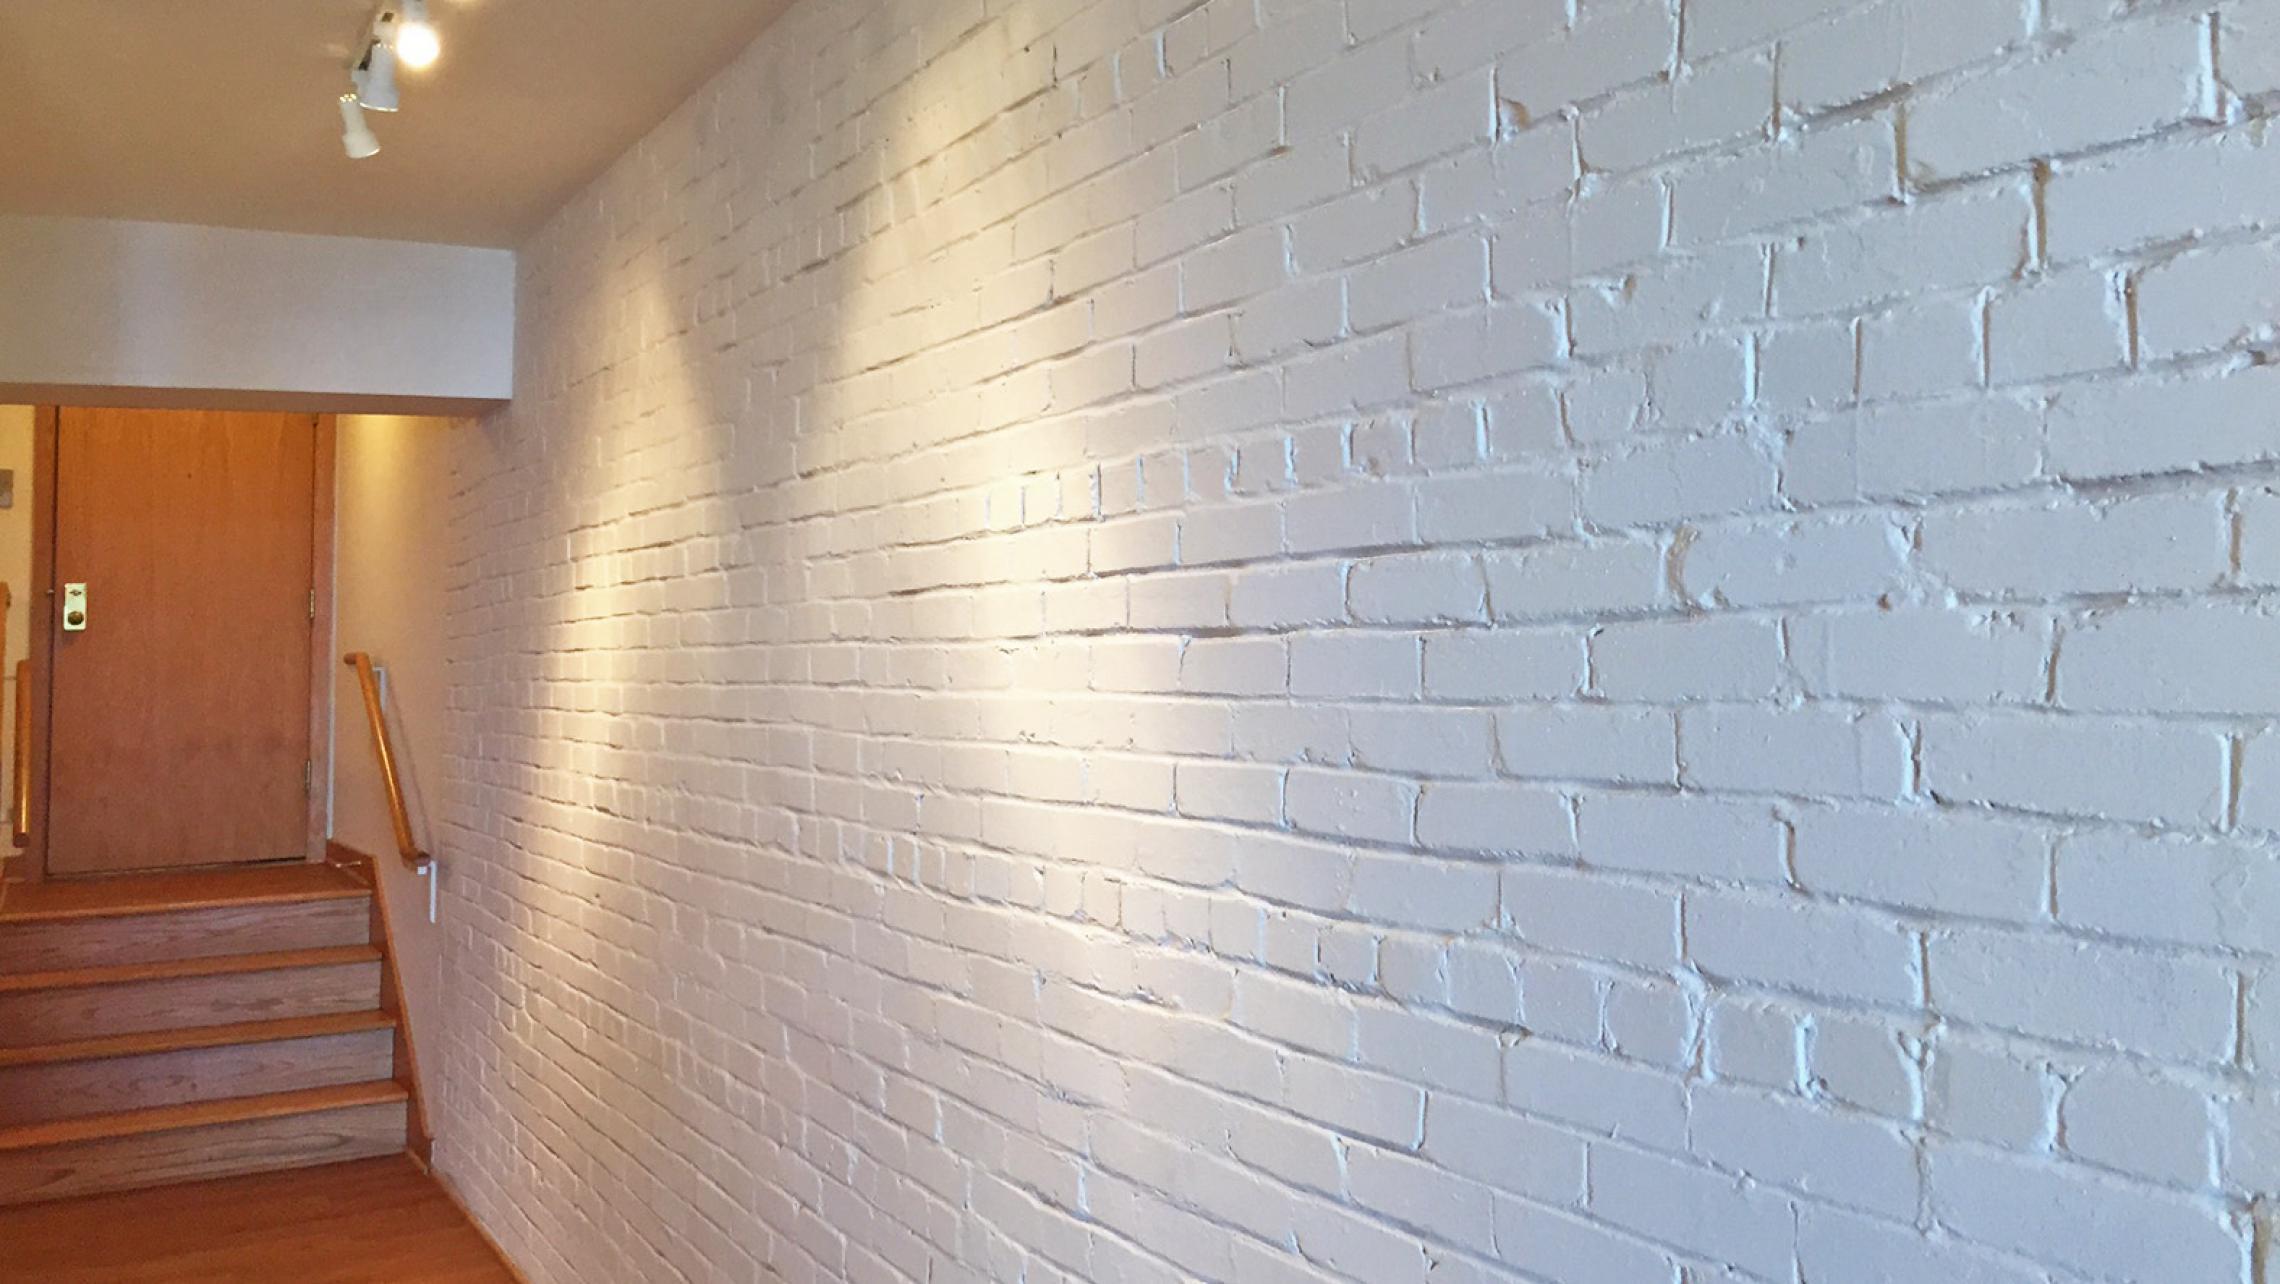 ULI Lincoln School Apartment 205 - Historic Brick Wall